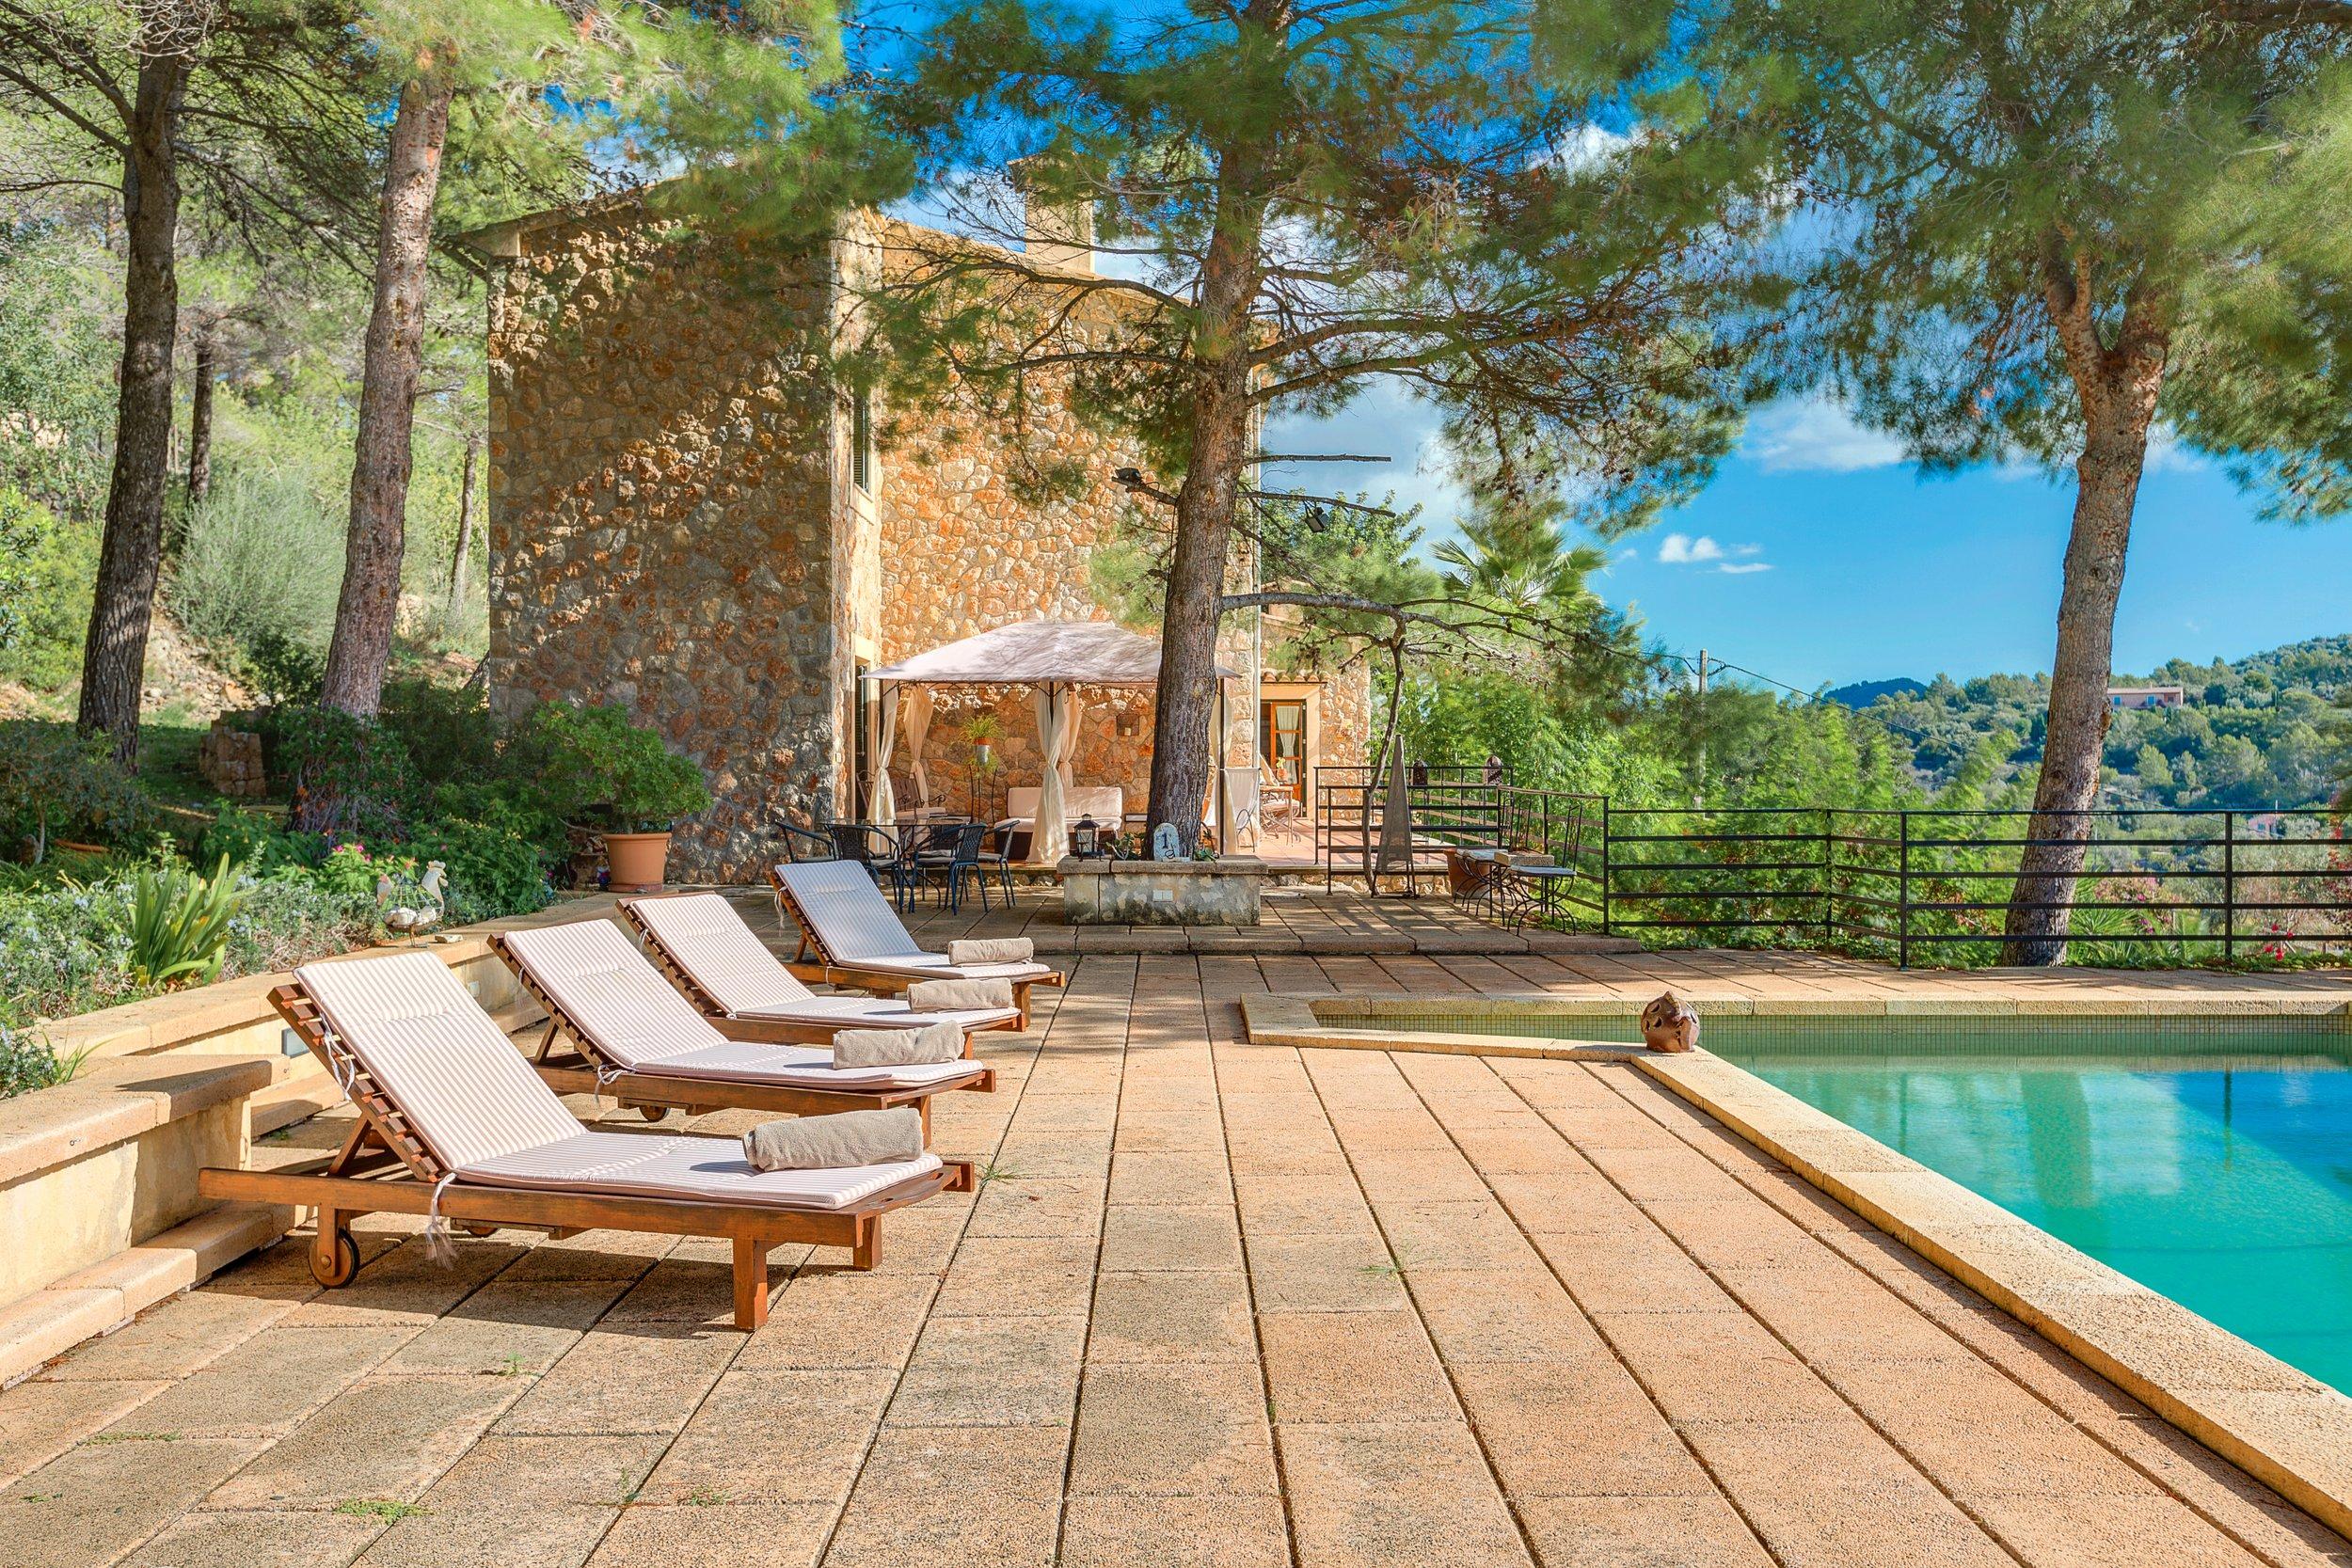 Maison de vacances Villa Cirera in Alaro (2611793), Alaro, Majorque, Iles Baléares, Espagne, image 2